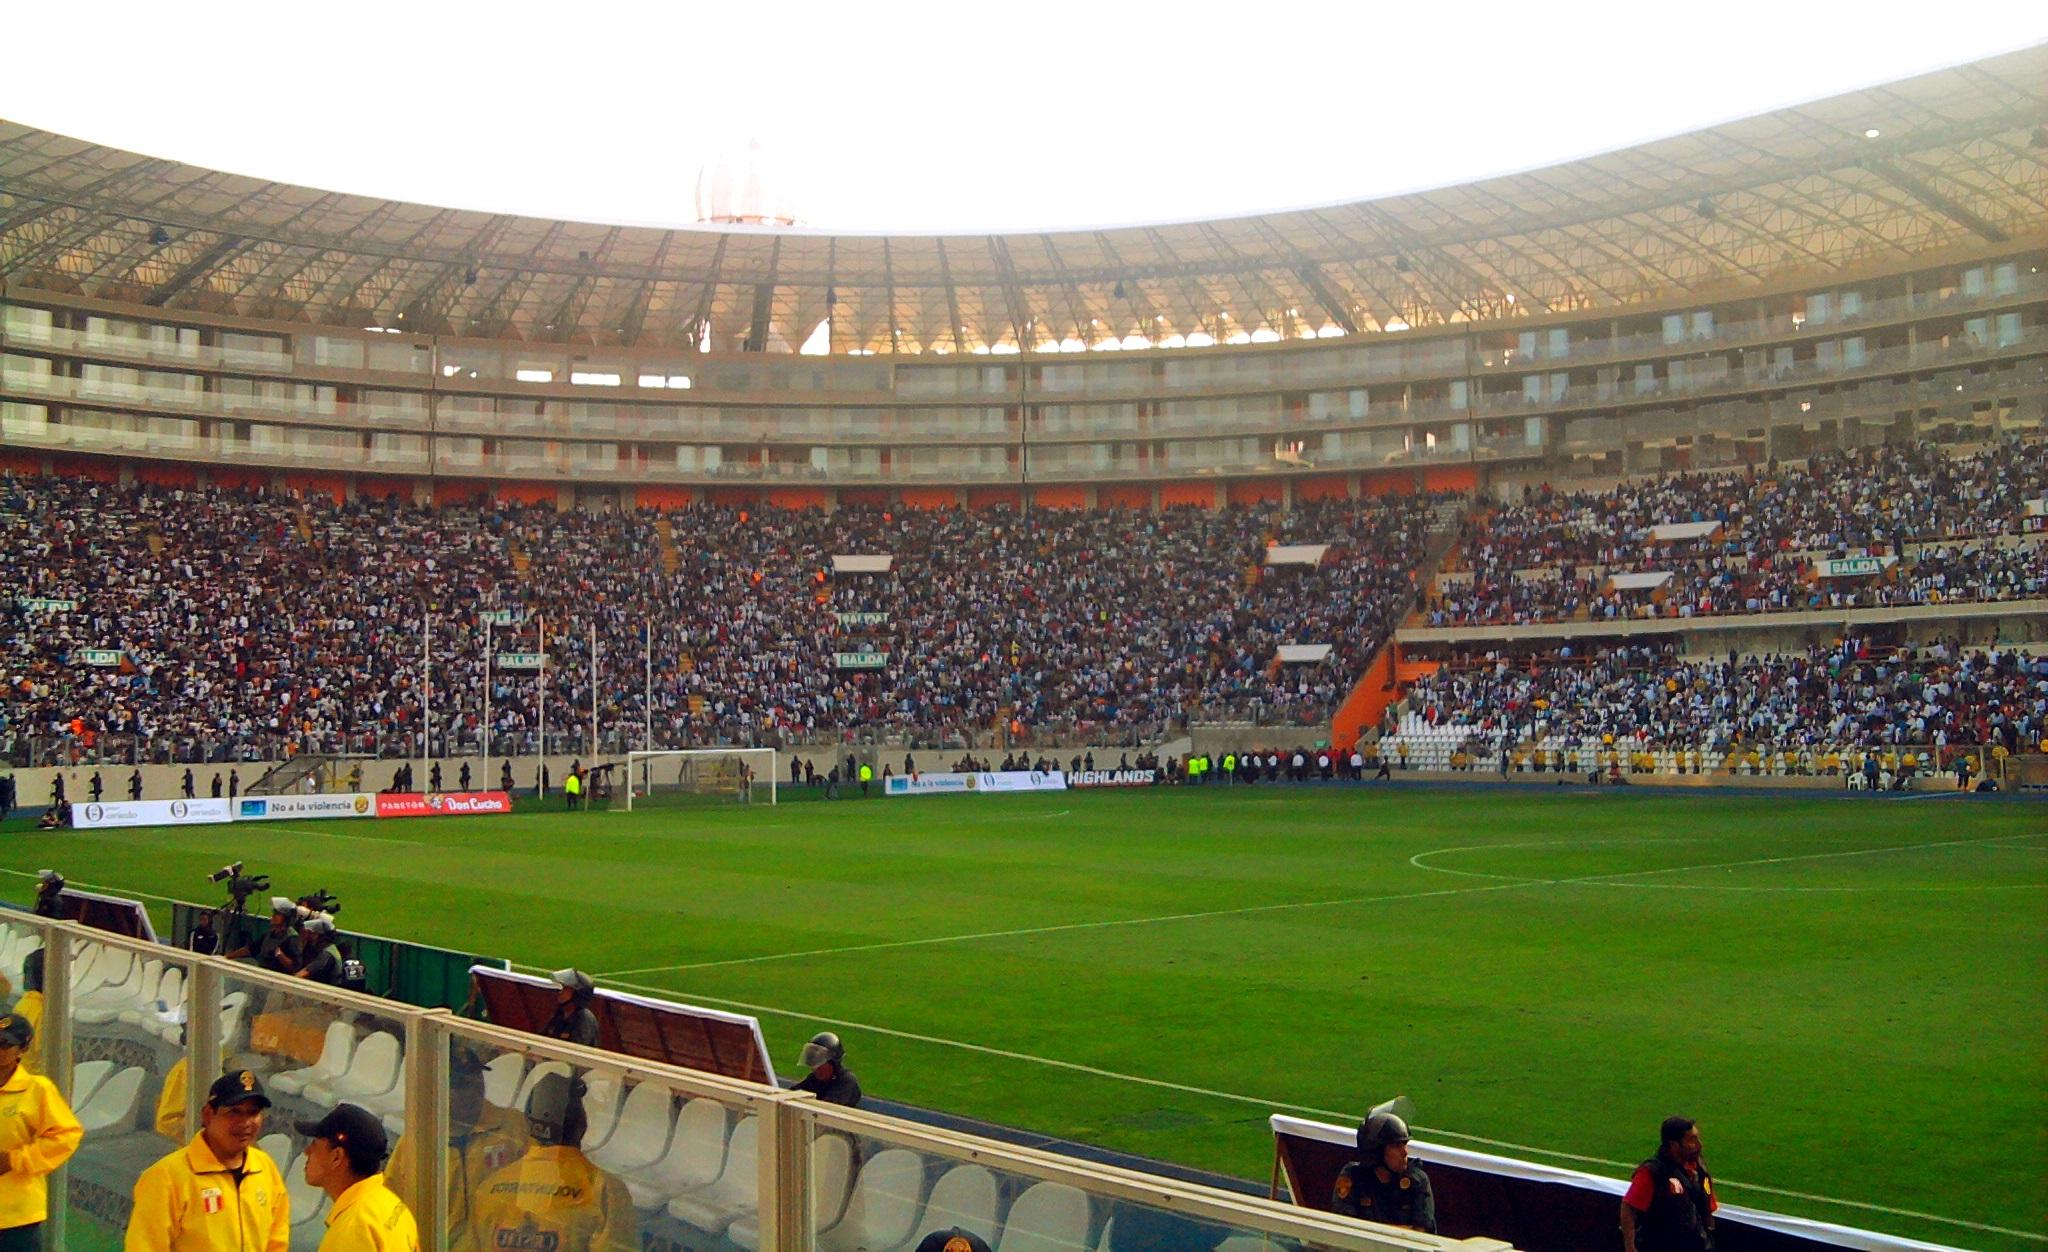 Nacional: File:Inside Estadio Nacional (Lima, Peru).jpg